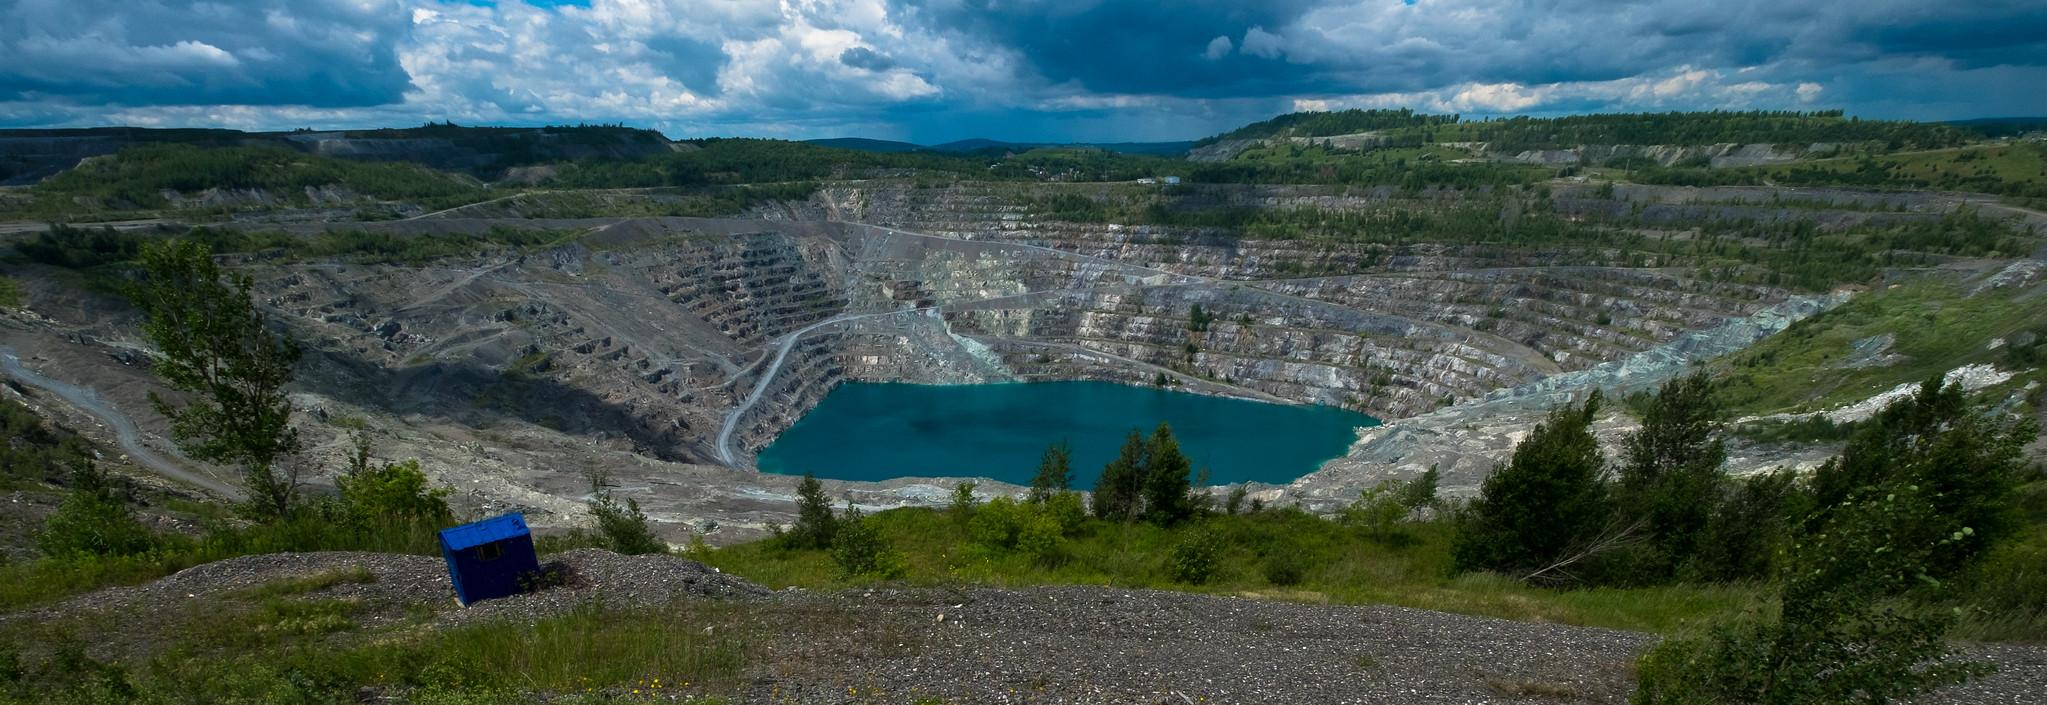 La mine Jeffrey en 2015